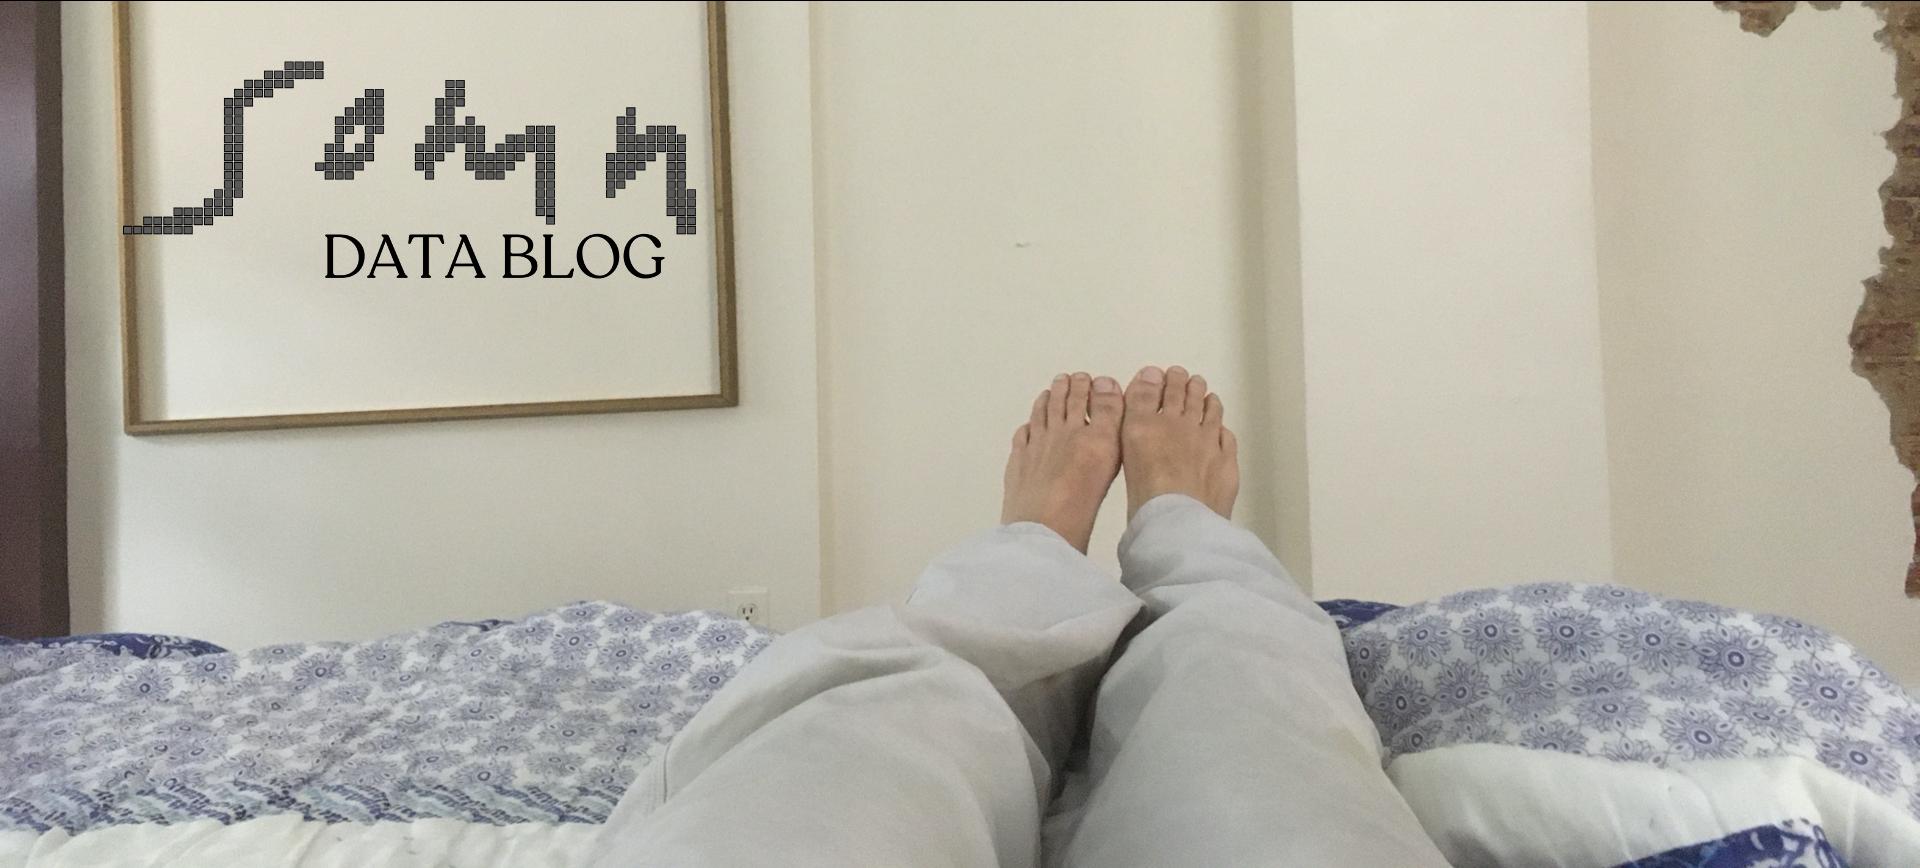 Bed Comfort and Sleep; Somn sleep data blog series